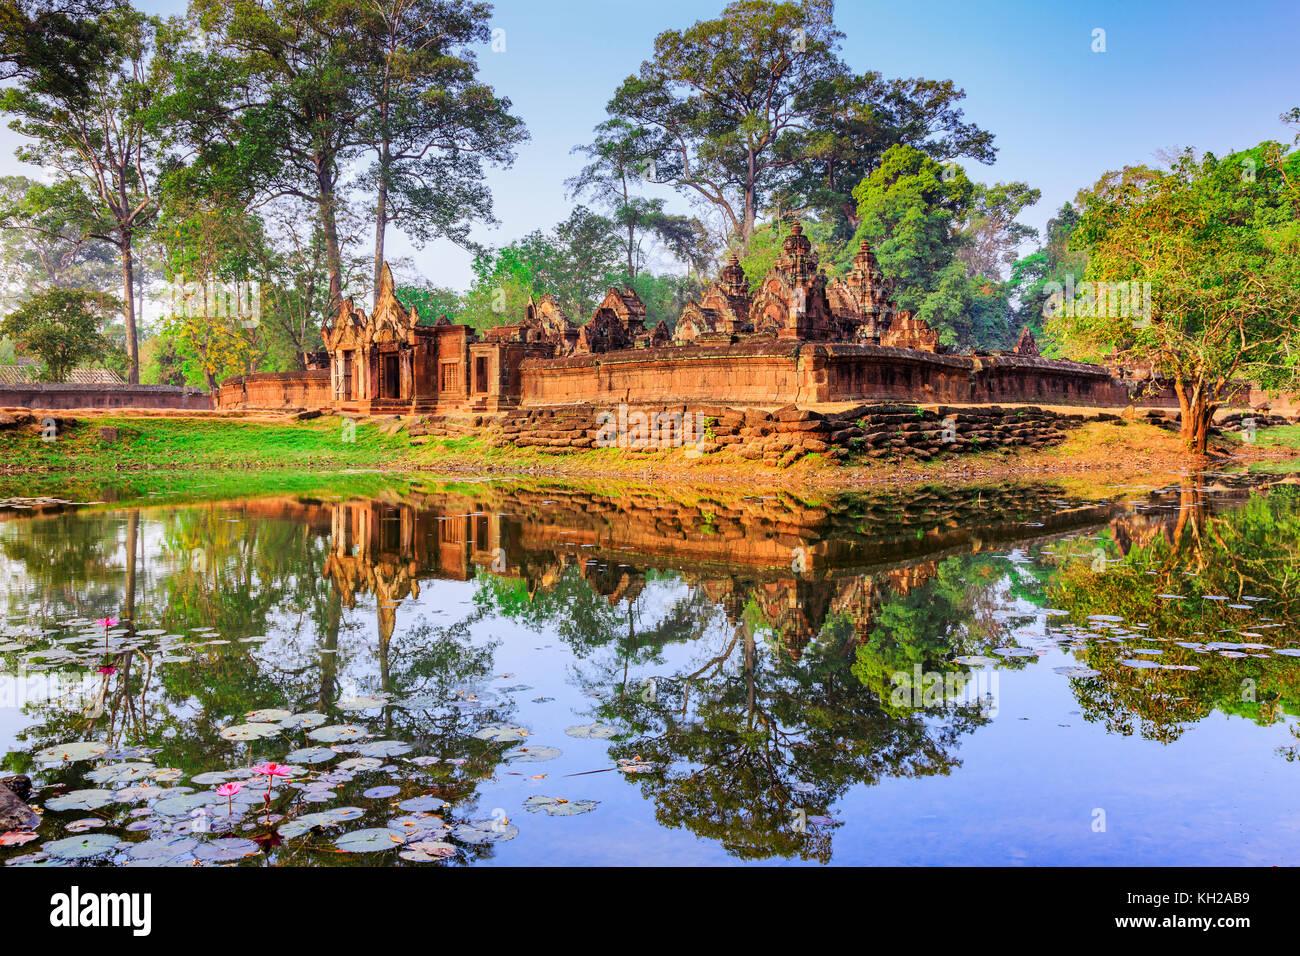 Angkor, Cambodge. BANTEAY SREI (Citadelle des femmes) temple. Photo Stock